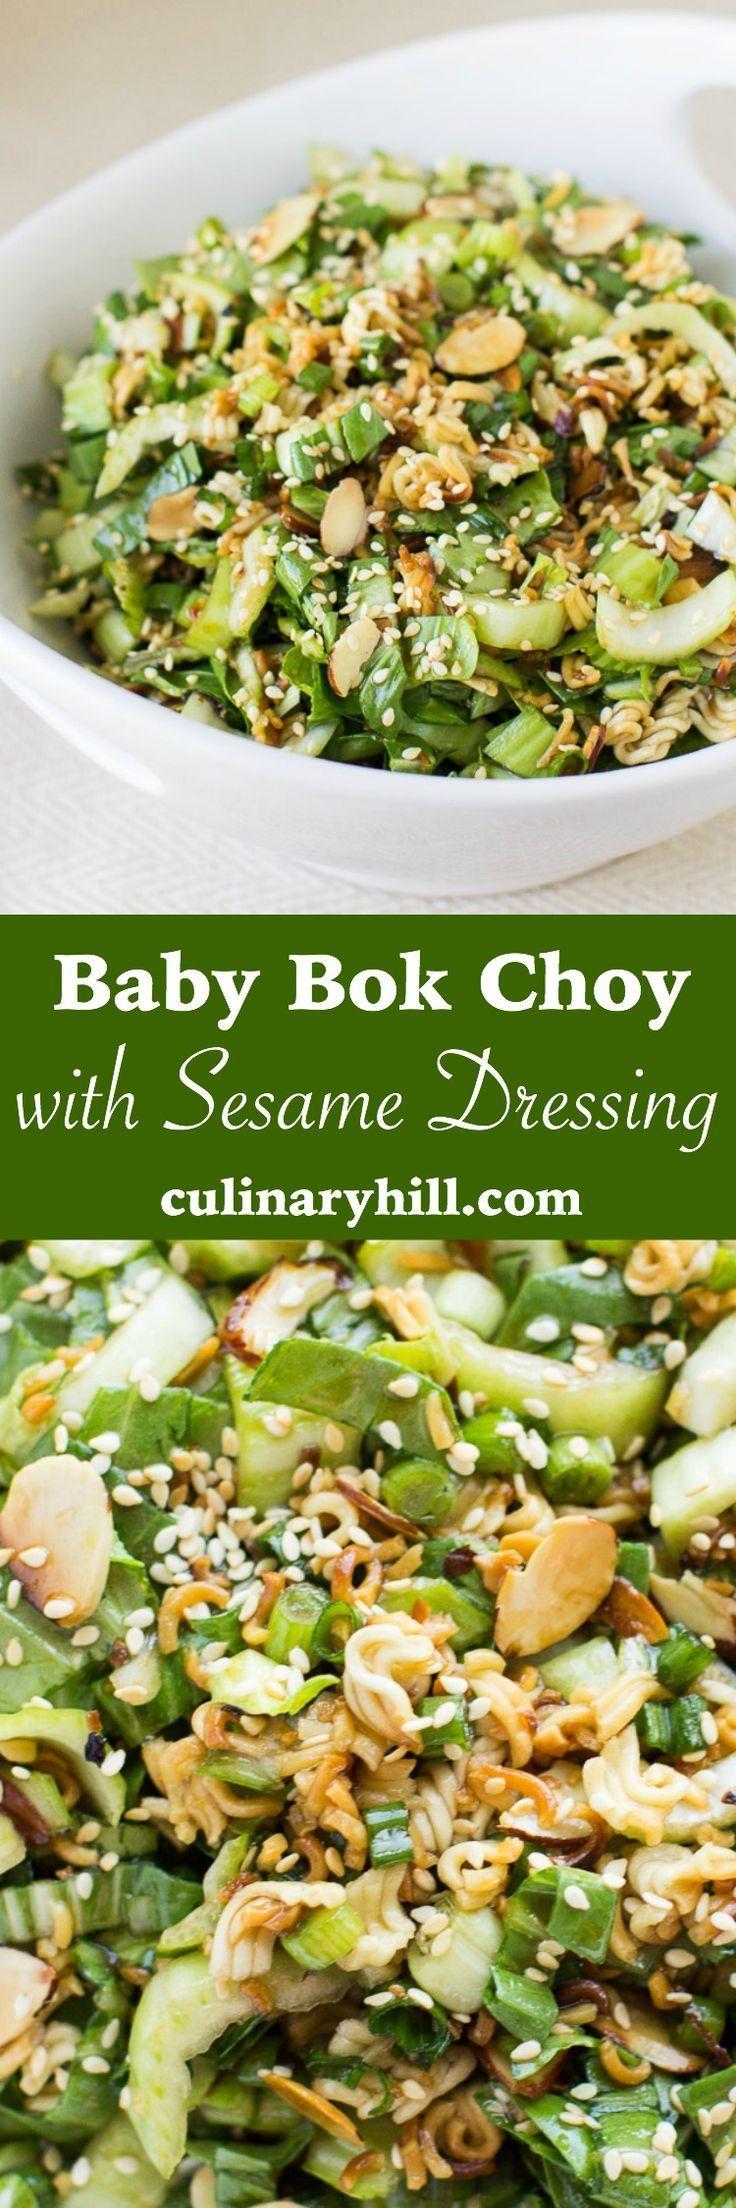 baby bok choy salad with sesame dressing recipe powder. Black Bedroom Furniture Sets. Home Design Ideas